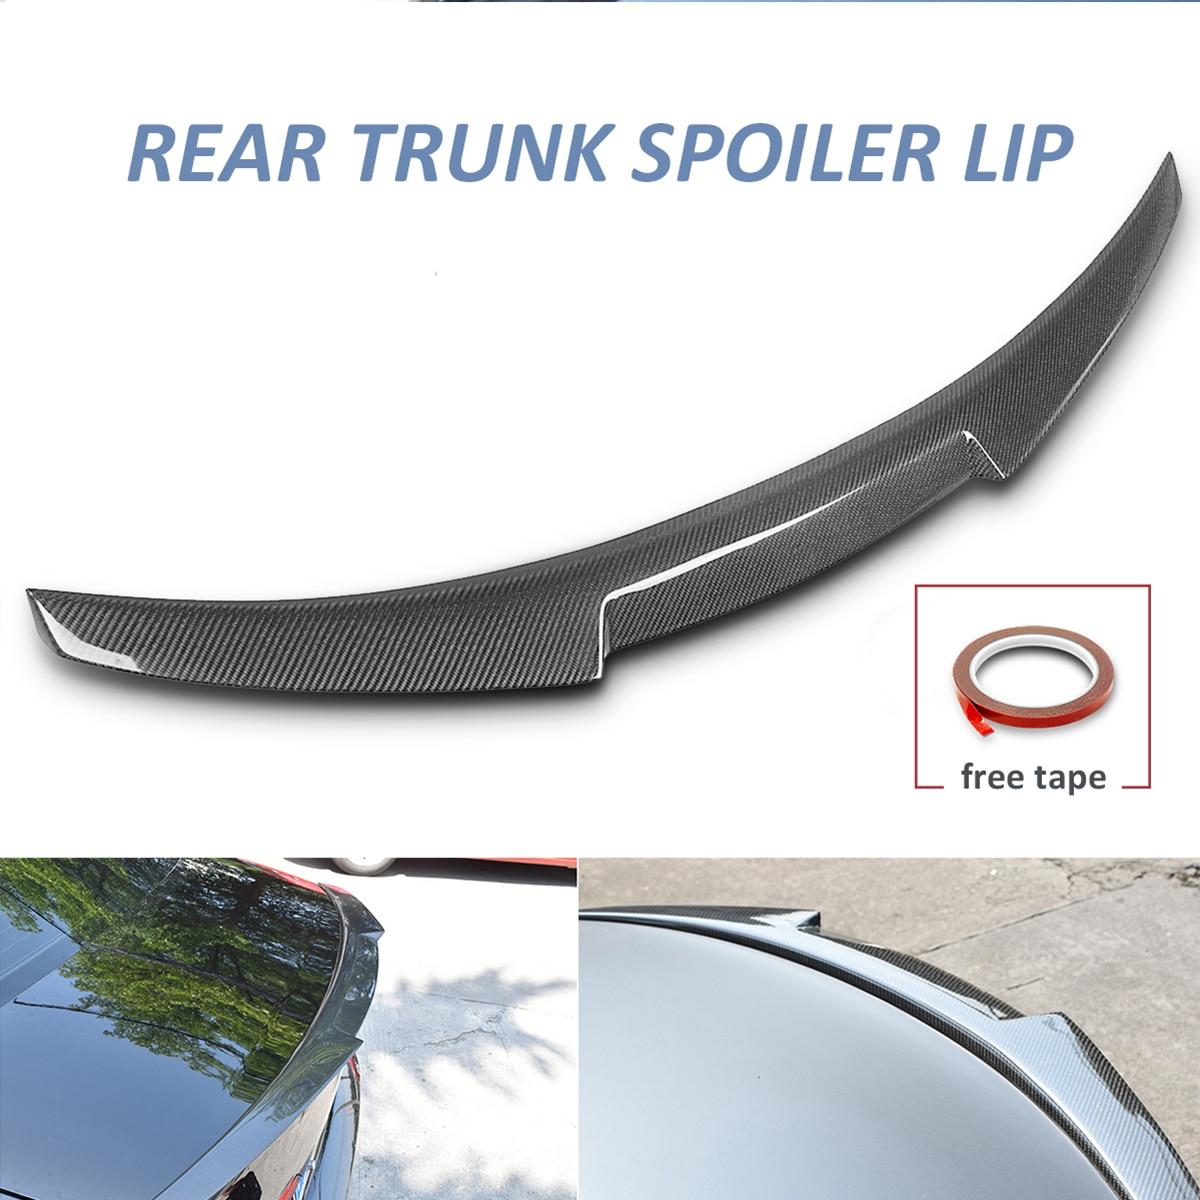 Real Carbon Fiber Rear Trunk Spoiler Lip M4 Style For Audi A6 C7 Sedan Quattro 2013-2016 Rear Wing Spoiler Rear Trunk Roof Wing for audi a6 c7 exterior car accessories carbon fiber rear boot trunk spoiler wing 2012 2015